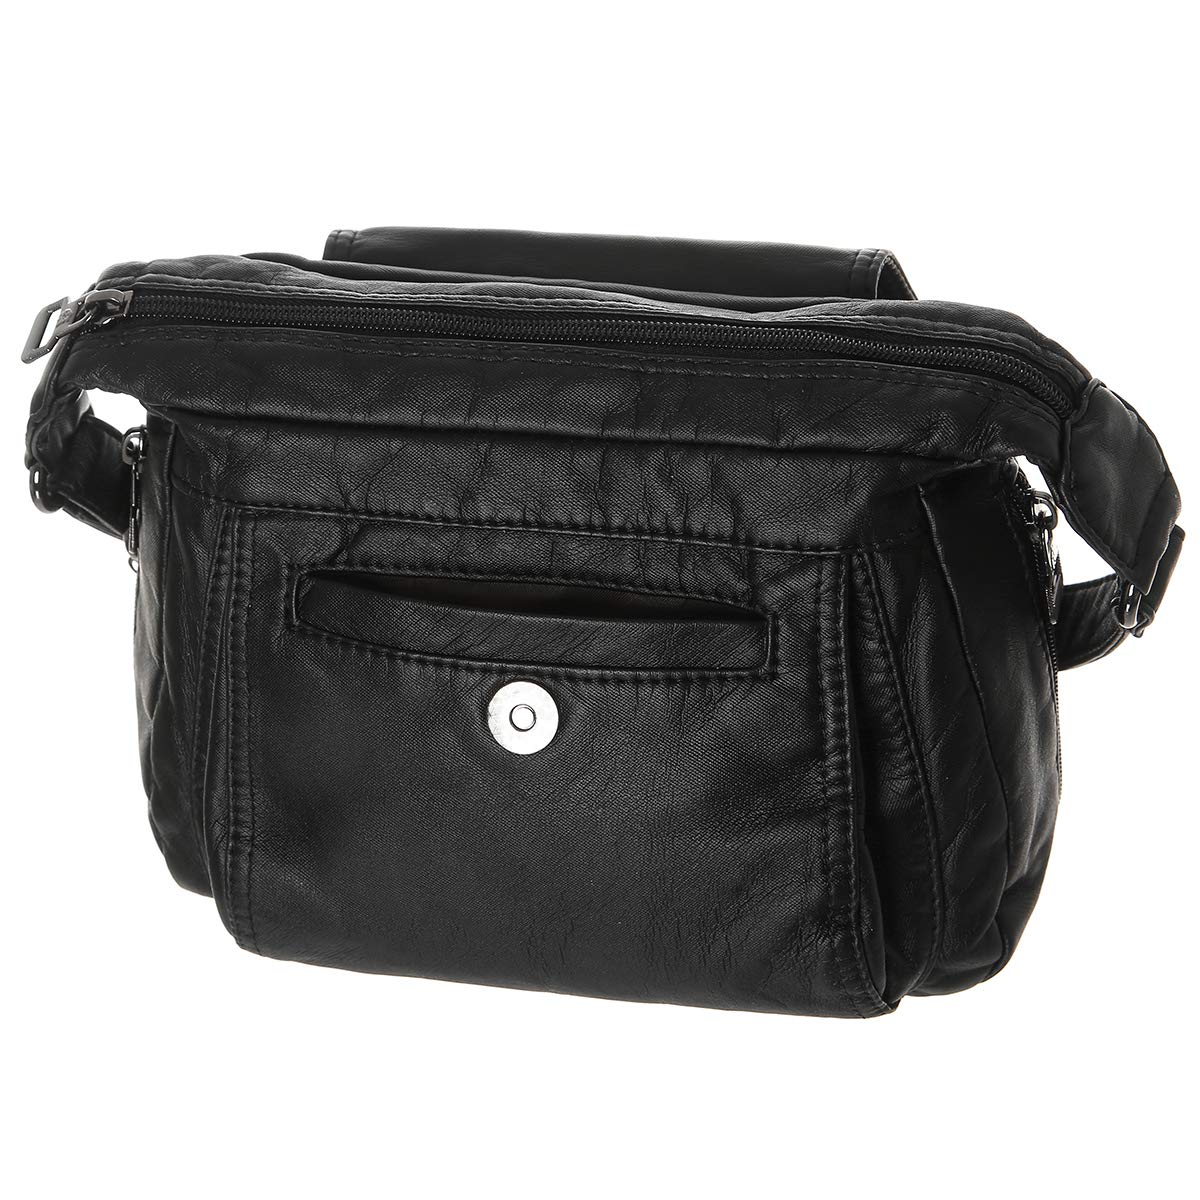 e4fece34fcd5 Women Multi Classify Pockets Medium Crossbody Purse Soft Synthetic Leather  Shoulder Bag(Black)  Handbags  Amazon.com